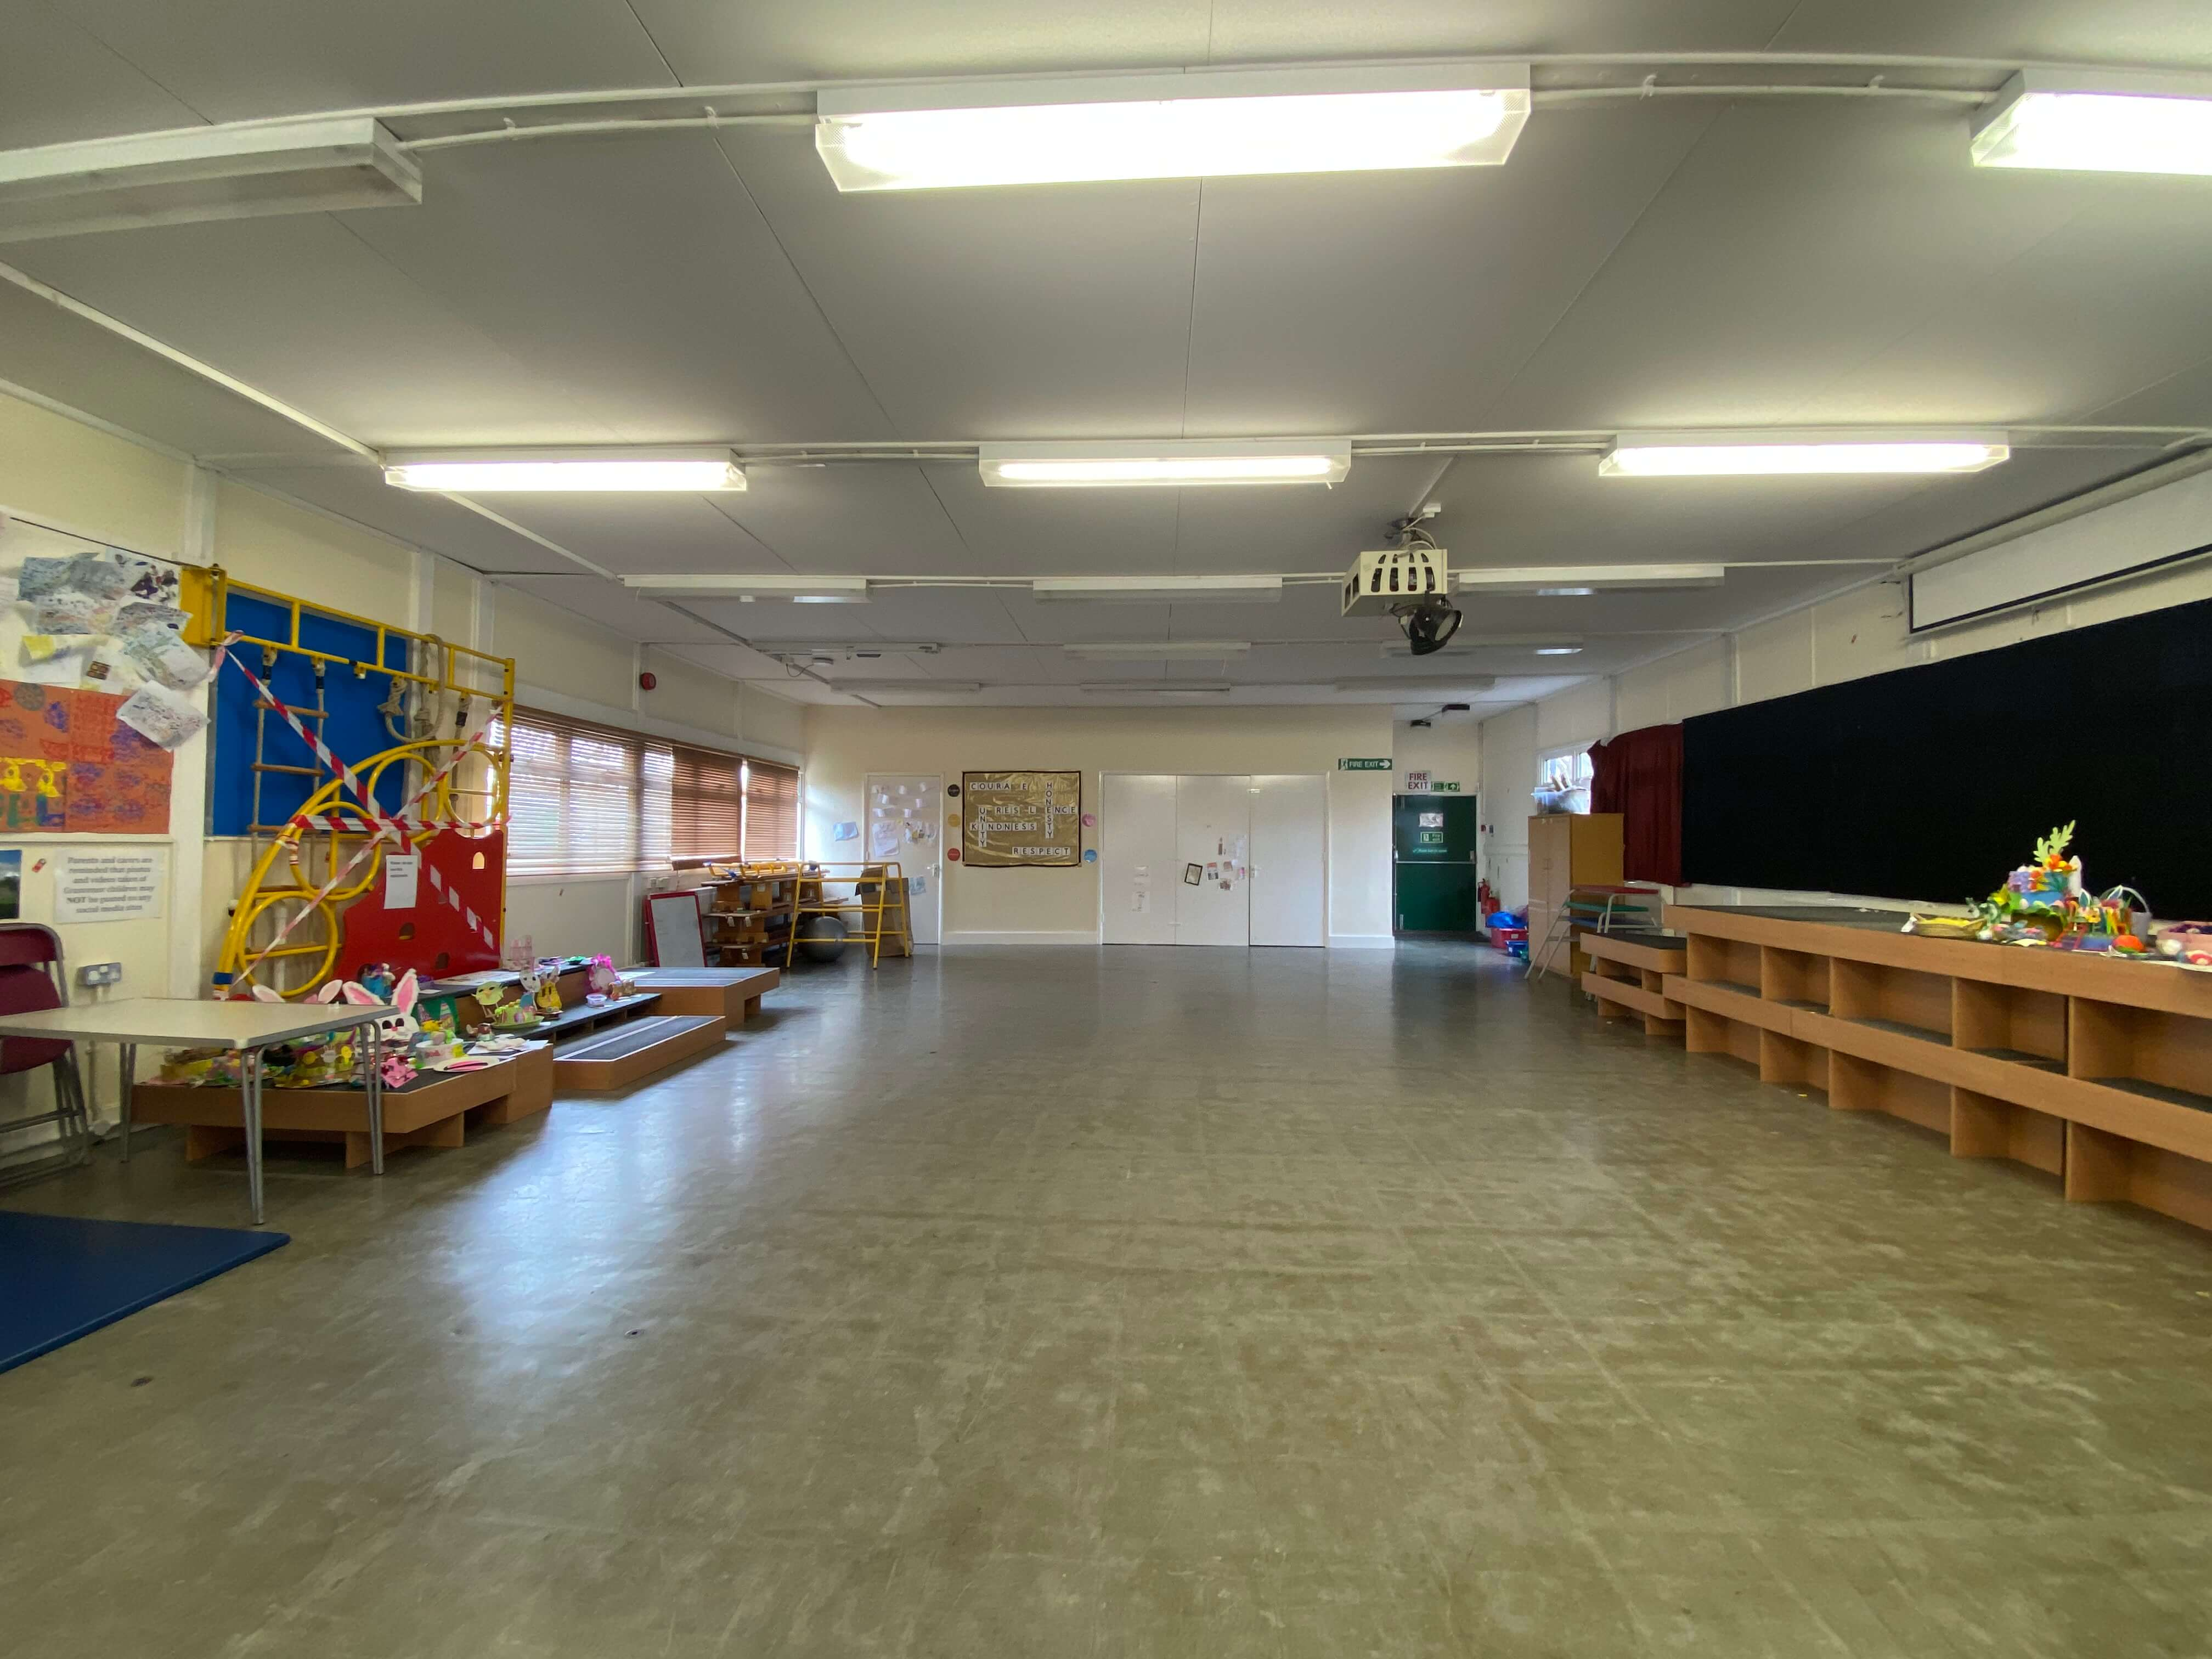 Grasvenor Avenue Infant Main Hall